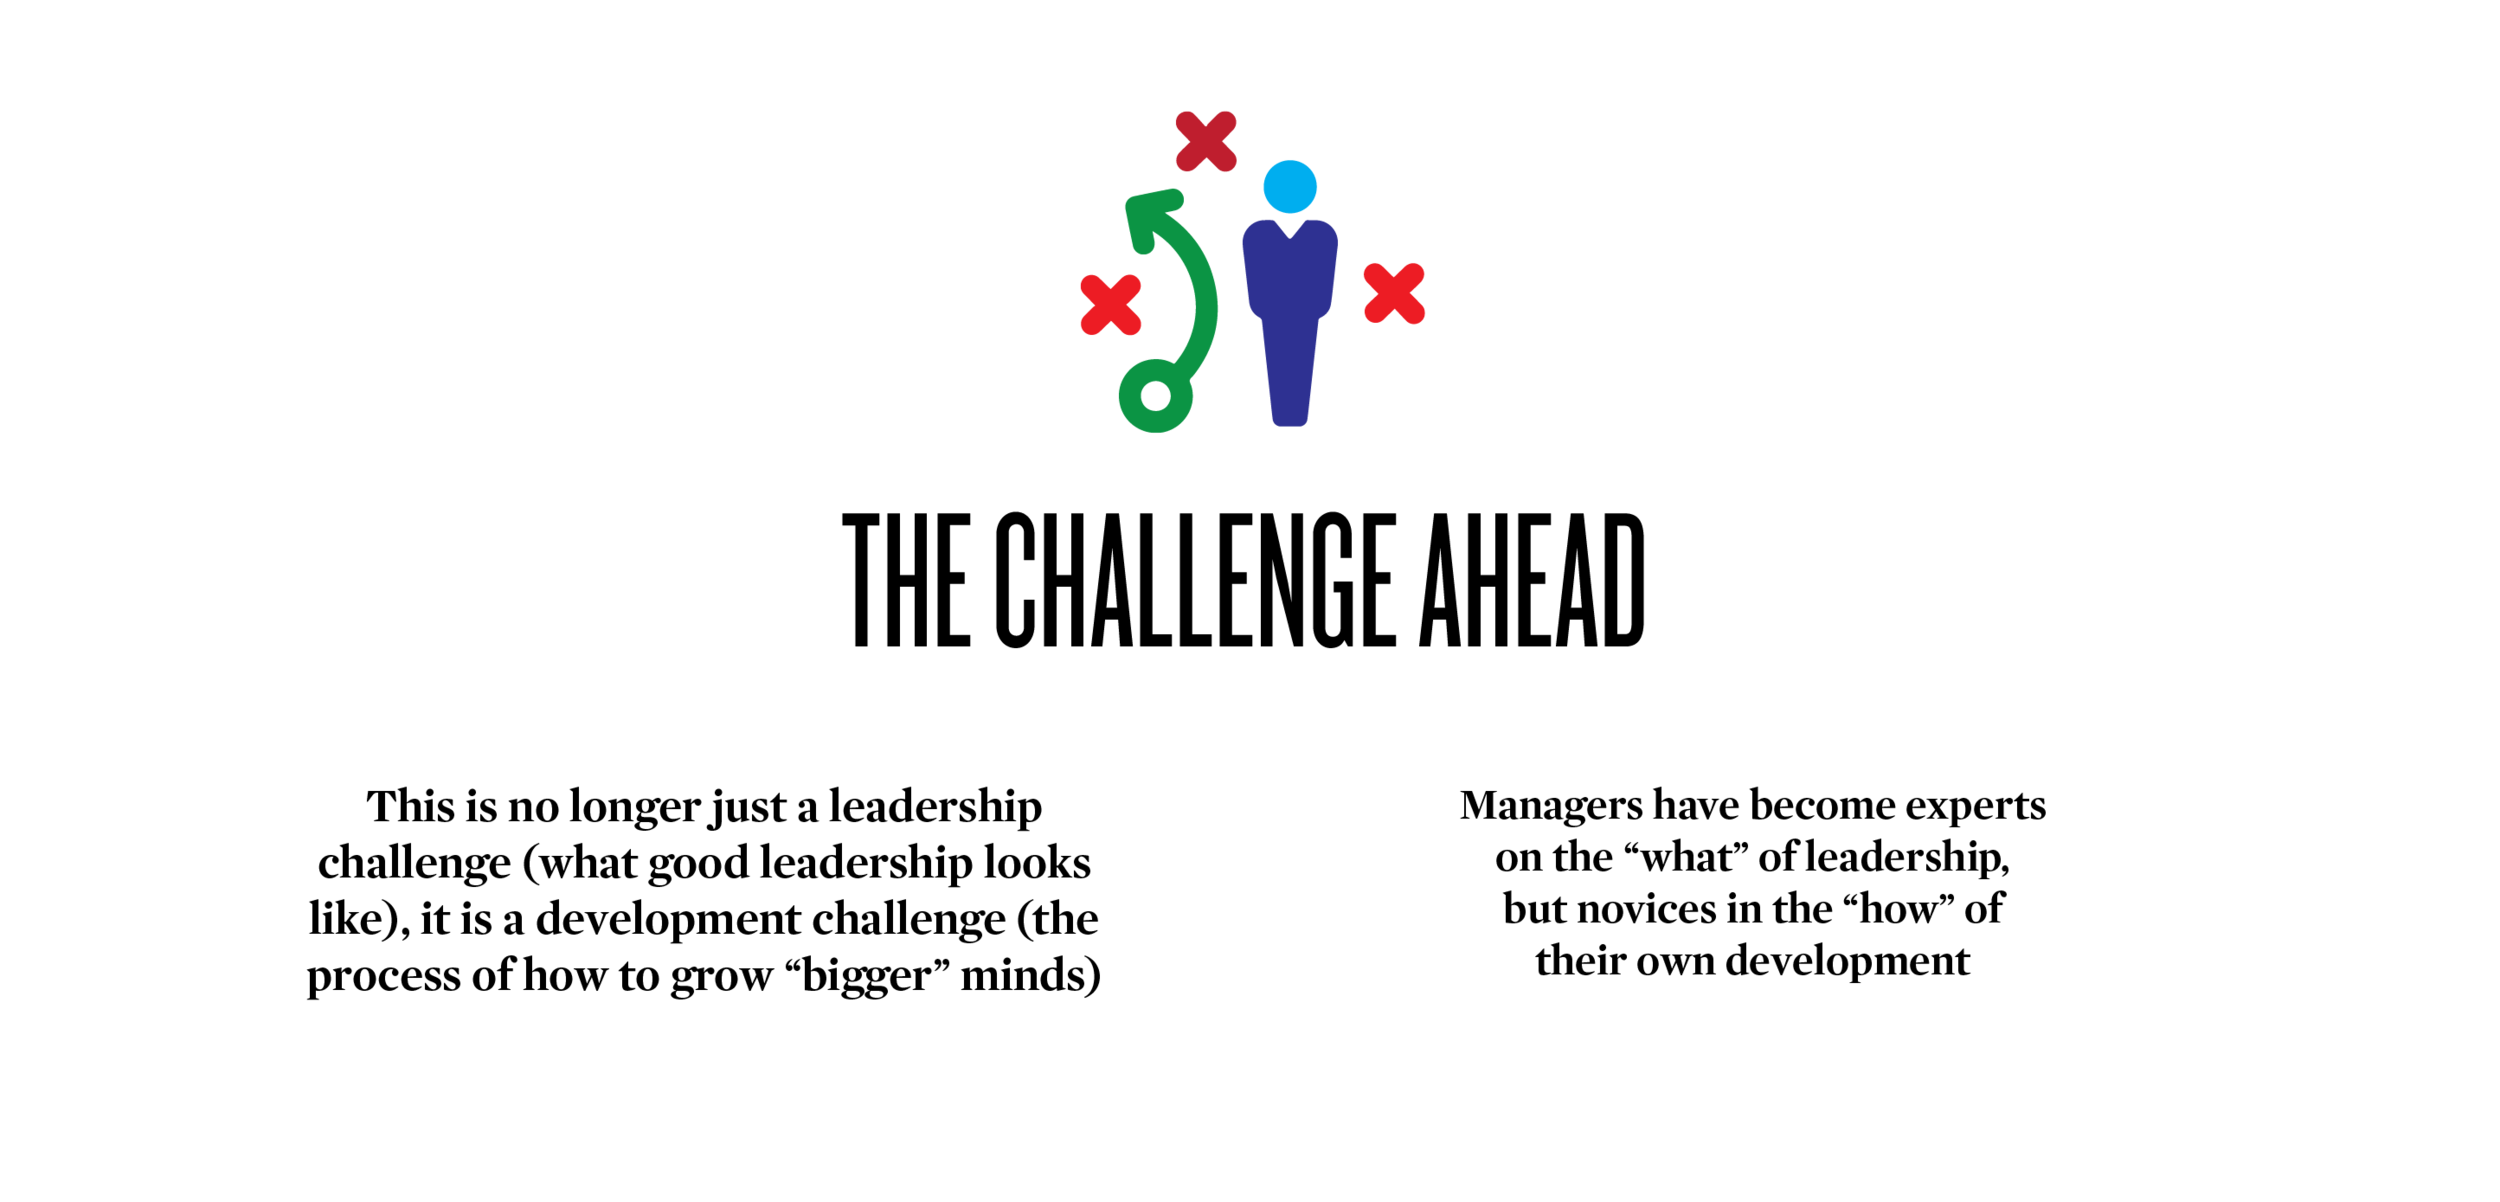 GGdiagram copy 2.png